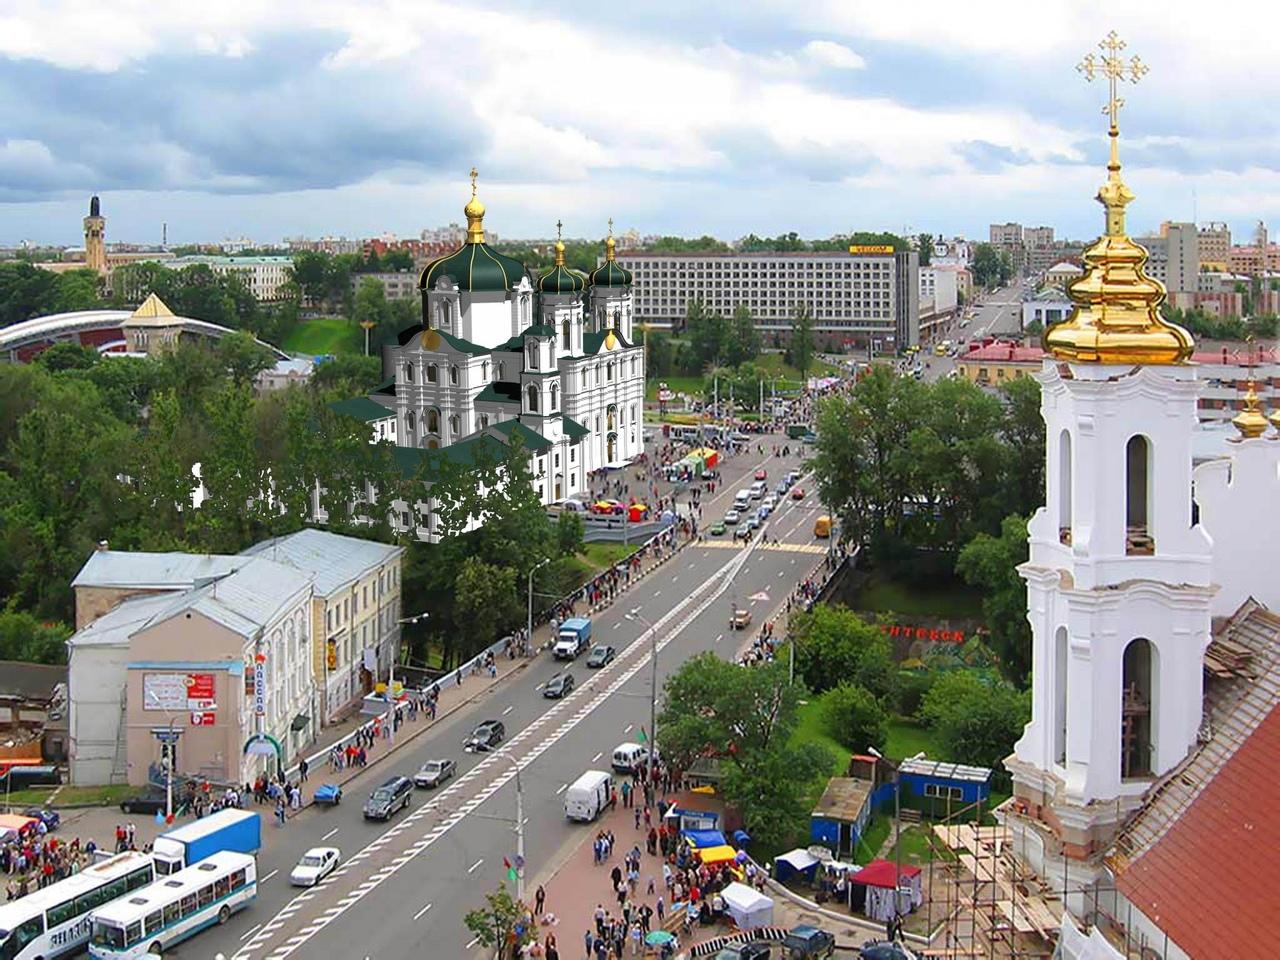 8Zwycje4JCk Витебск - культурная столица Беларуси.